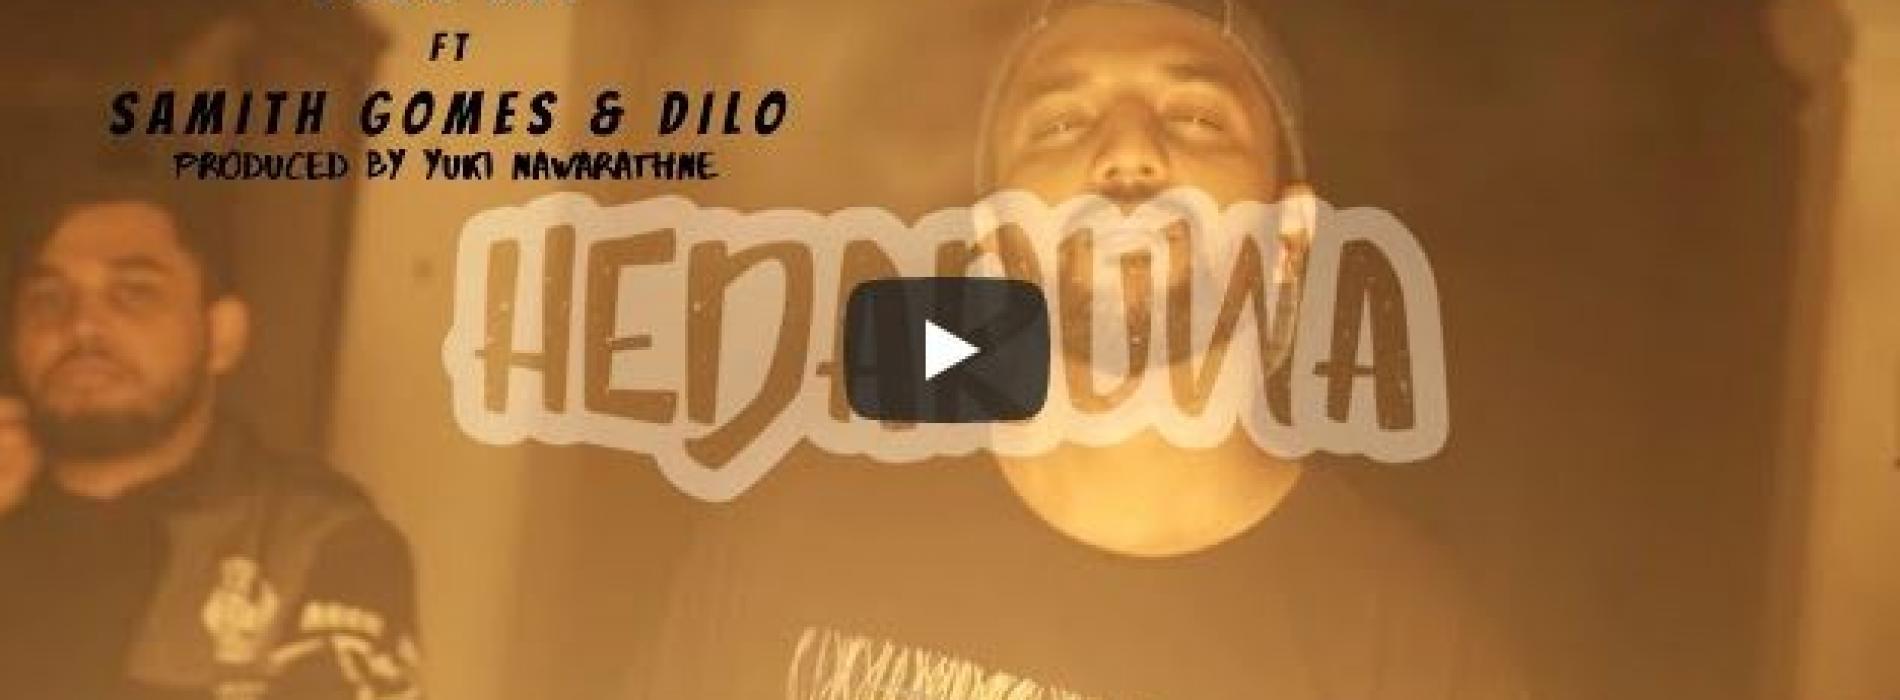 News: Hedaruwa ( හැඩරුව ) – Sash Jay Ft Samith Gomes & Dilo – Official Music Video Trailer